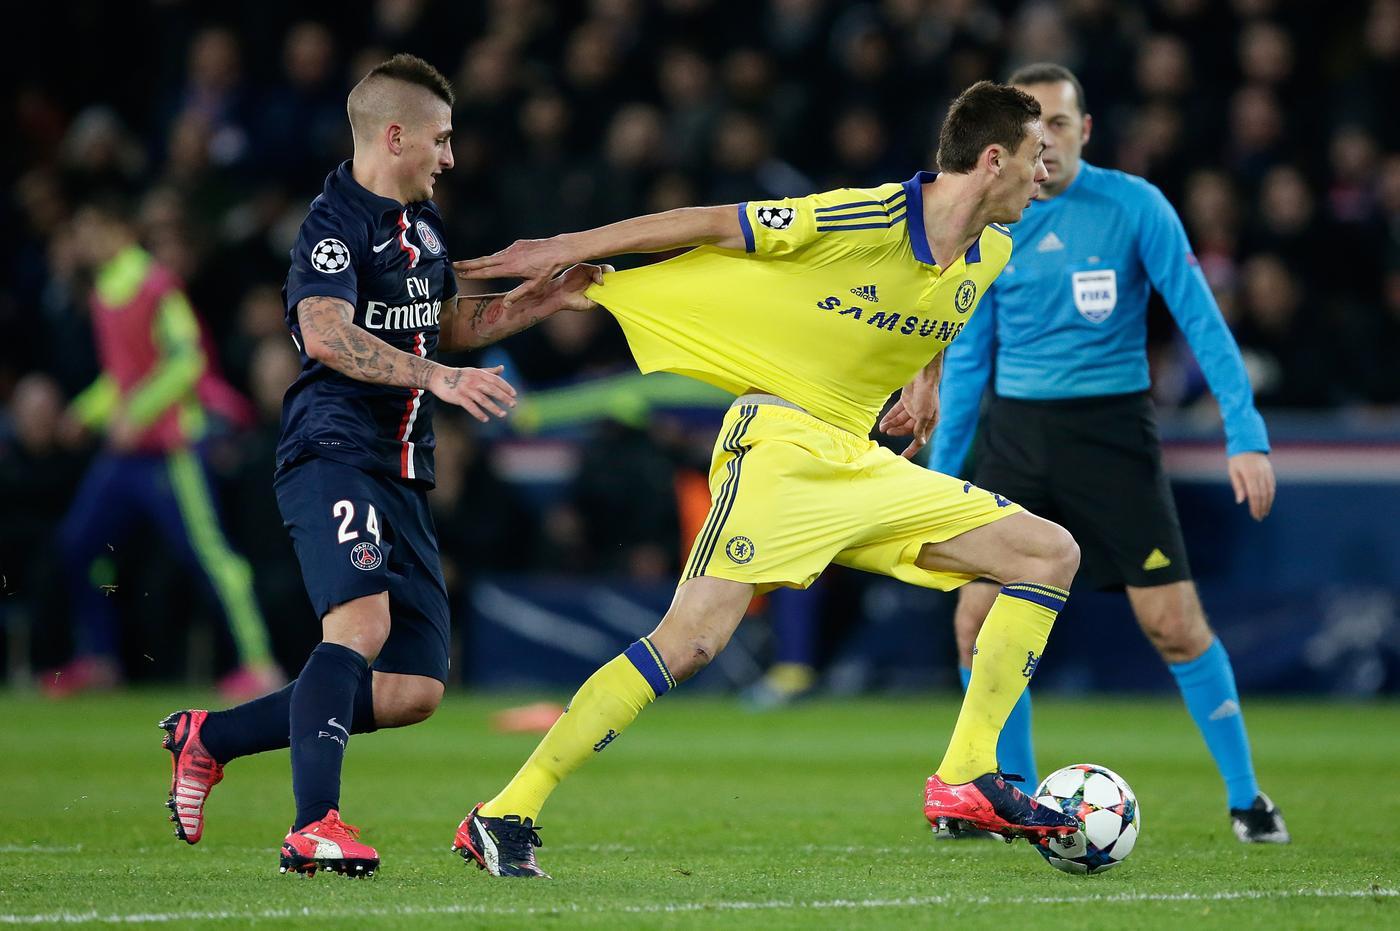 Nemanja Matic return means Chelsea are in good shape ahead of Champions League clash with Paris Saint-Germain